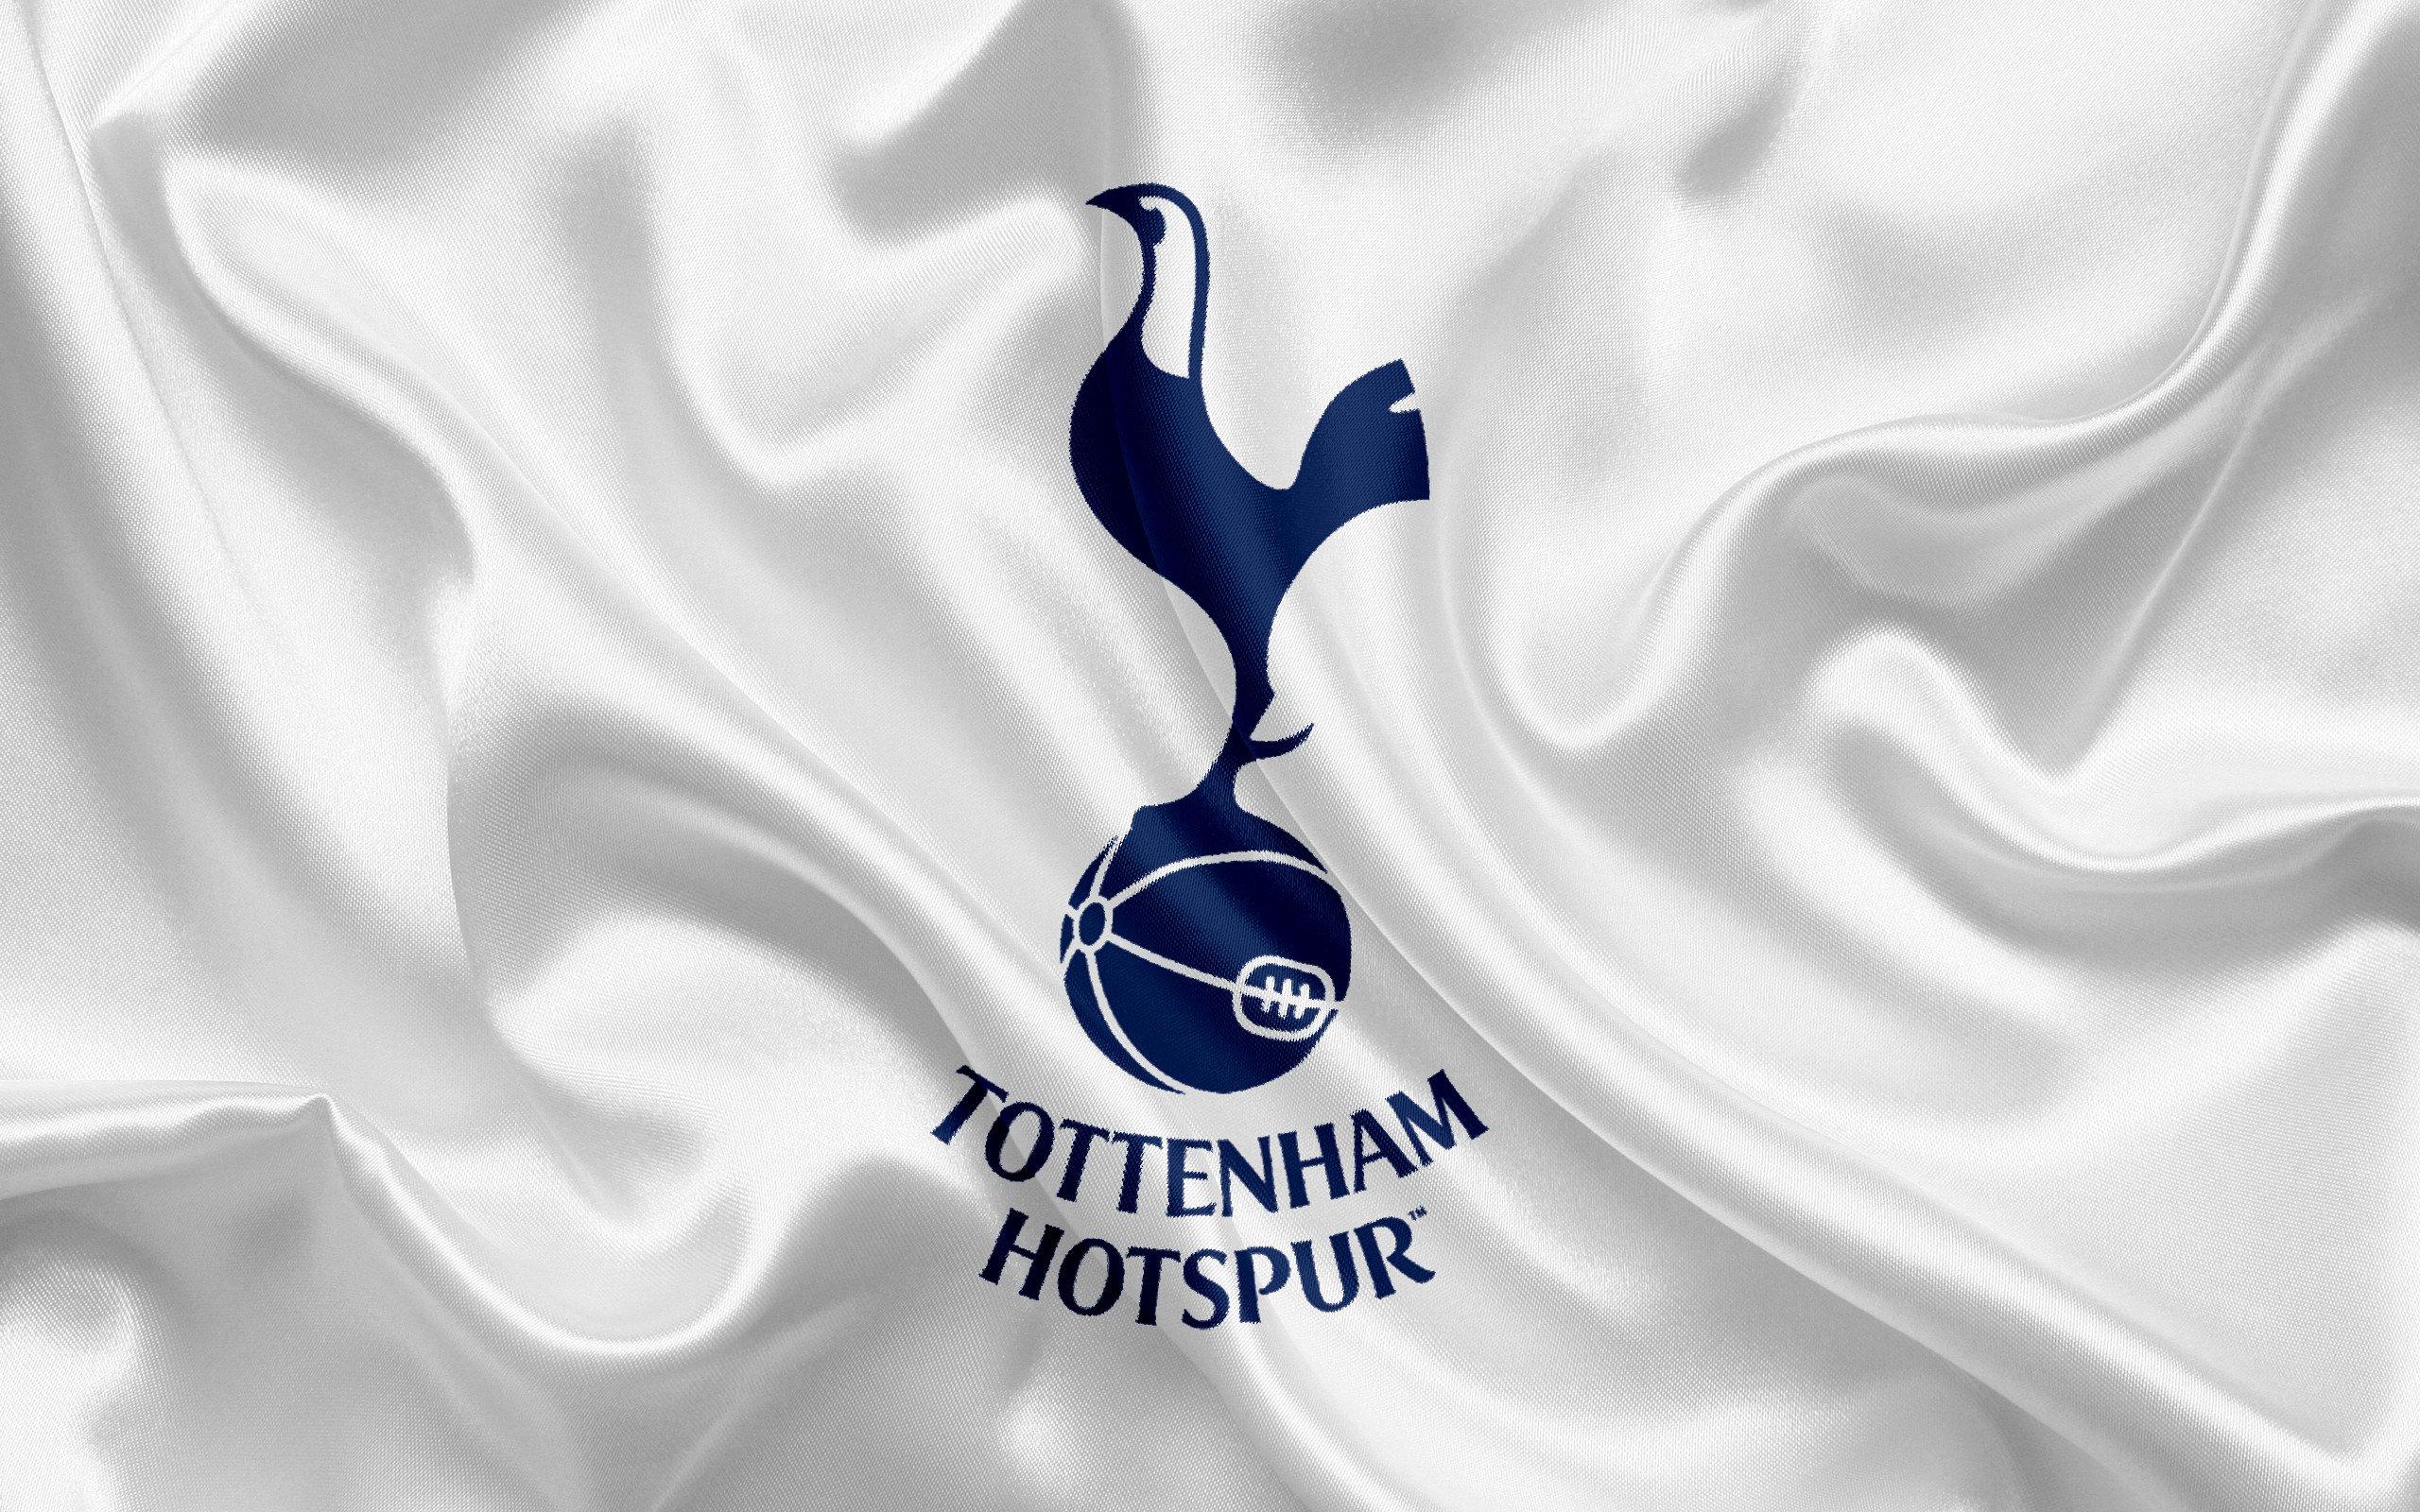 66 Tottenham Hotspur Wallpapers on WallpaperPlay 2560x1600